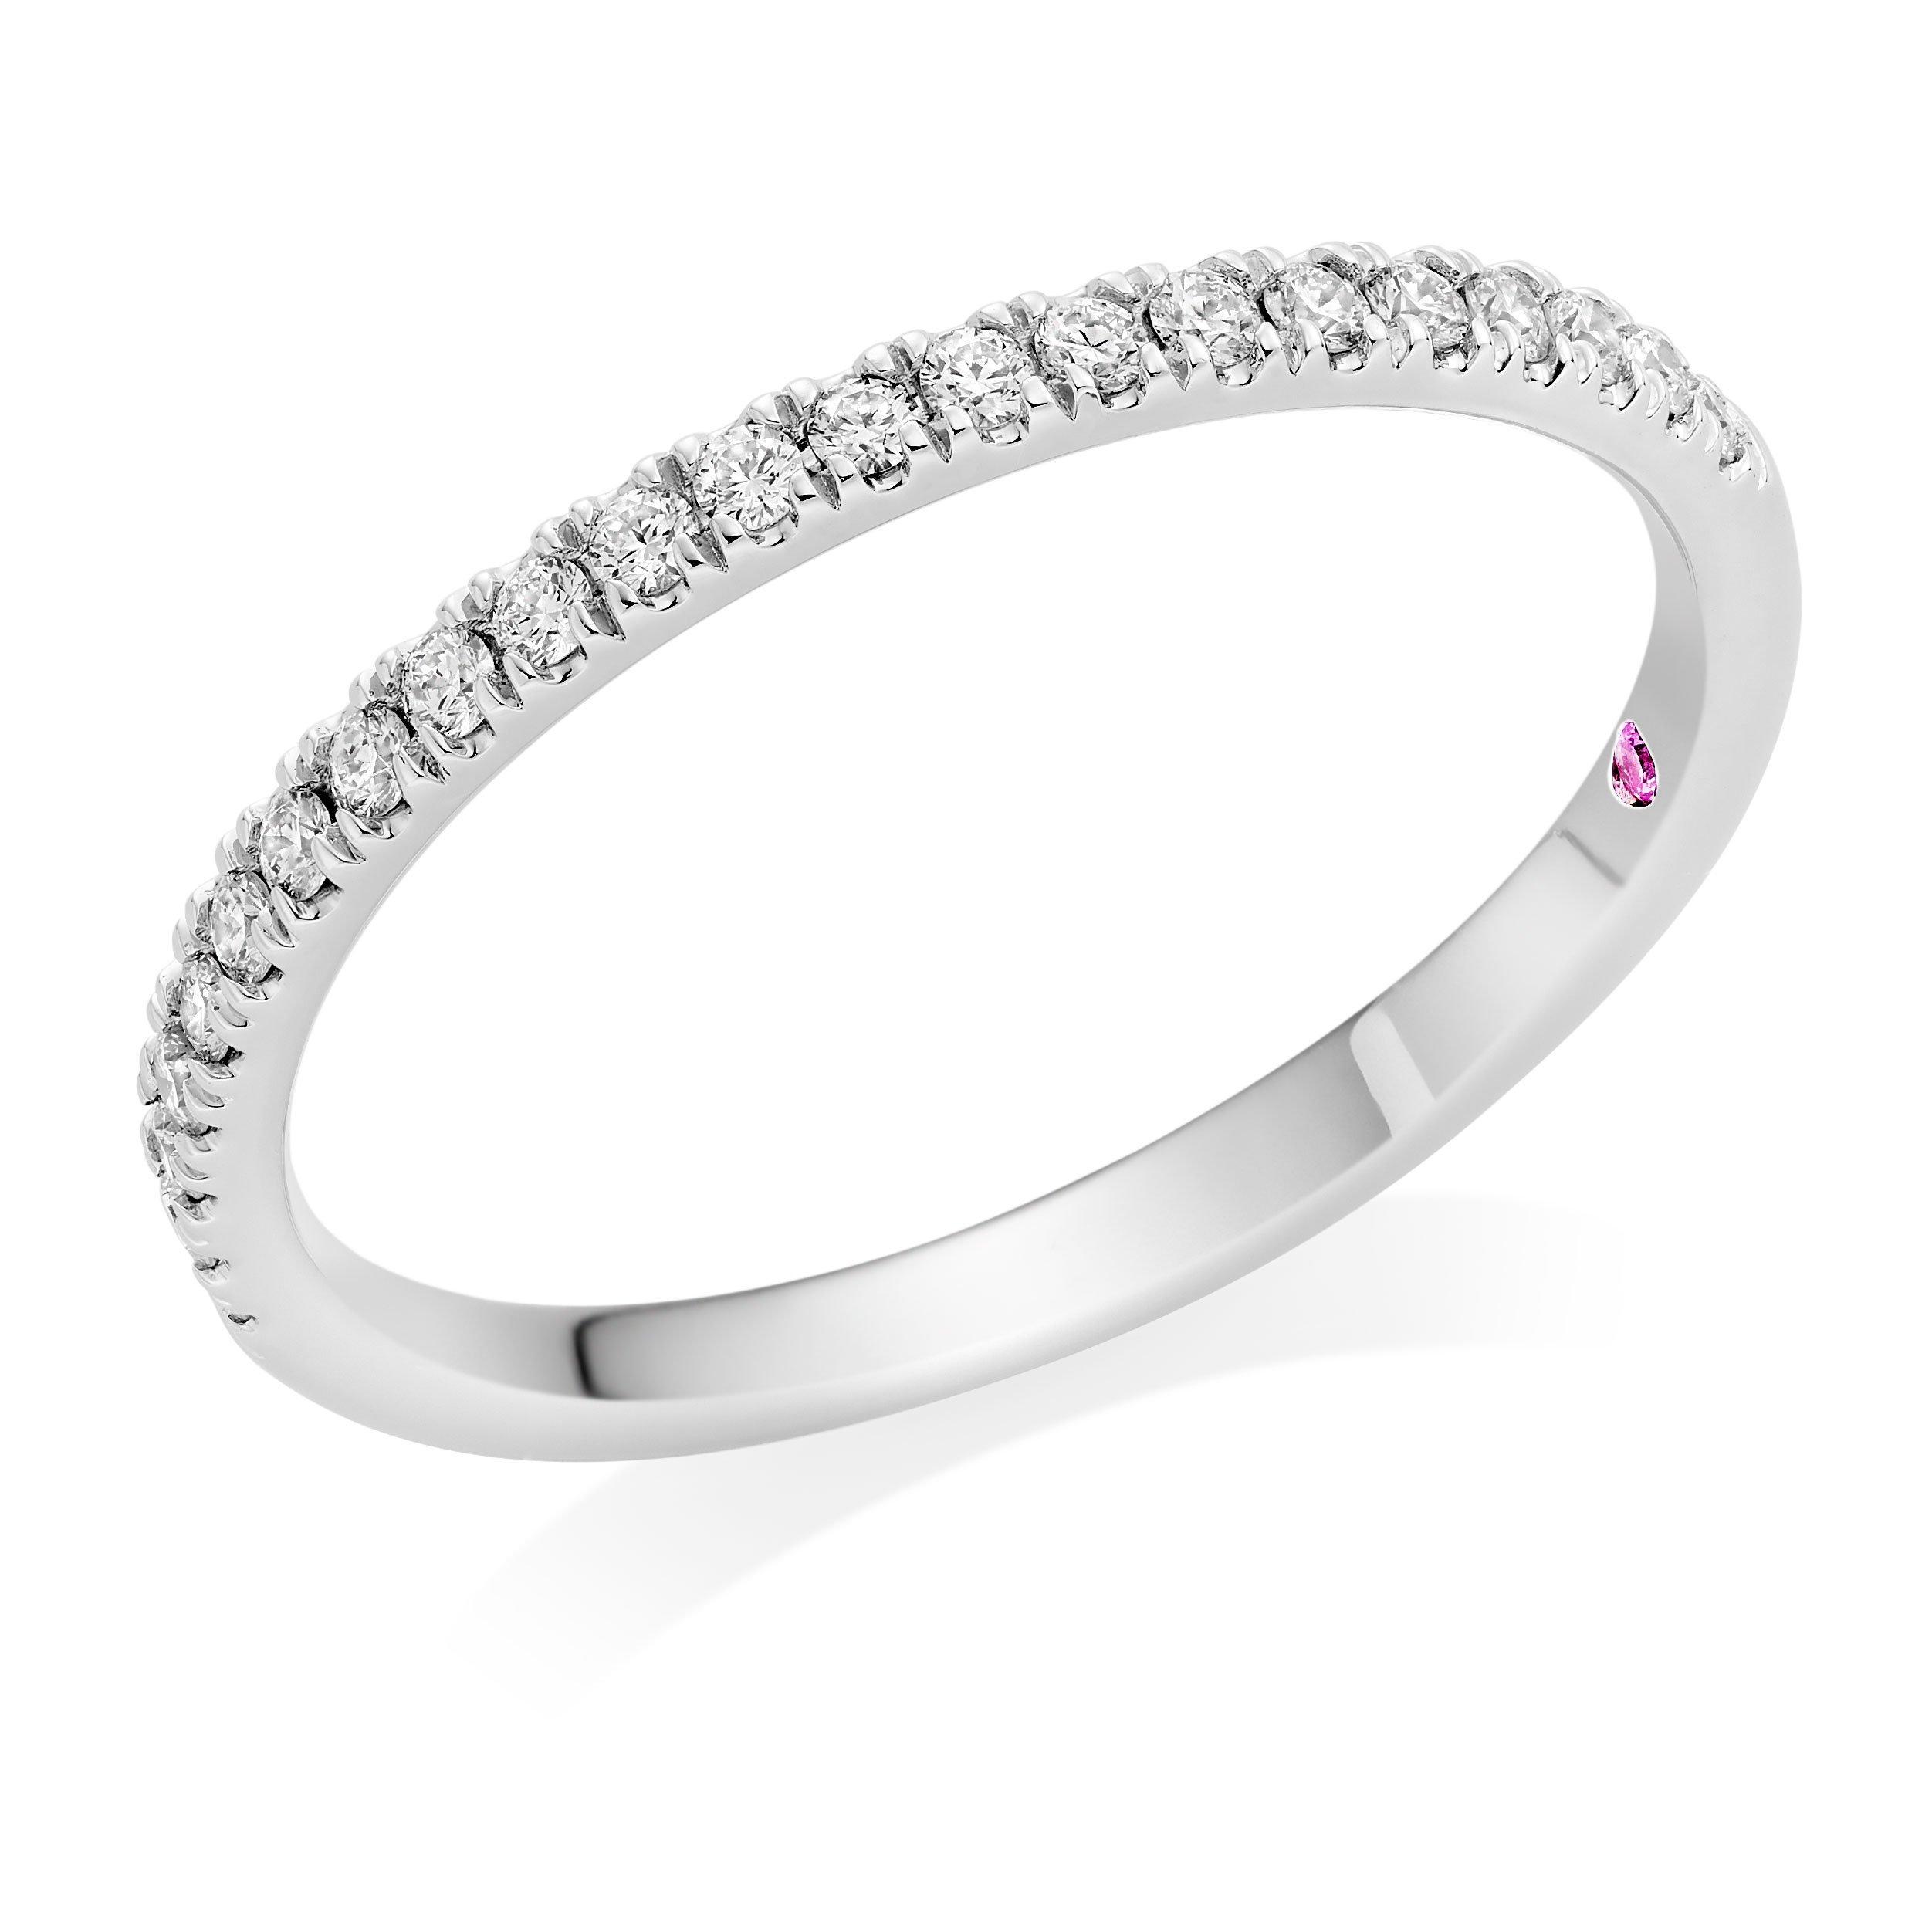 Hearts On Fire Hayley Paige Sloane Platinum Diamond Wedding Ring